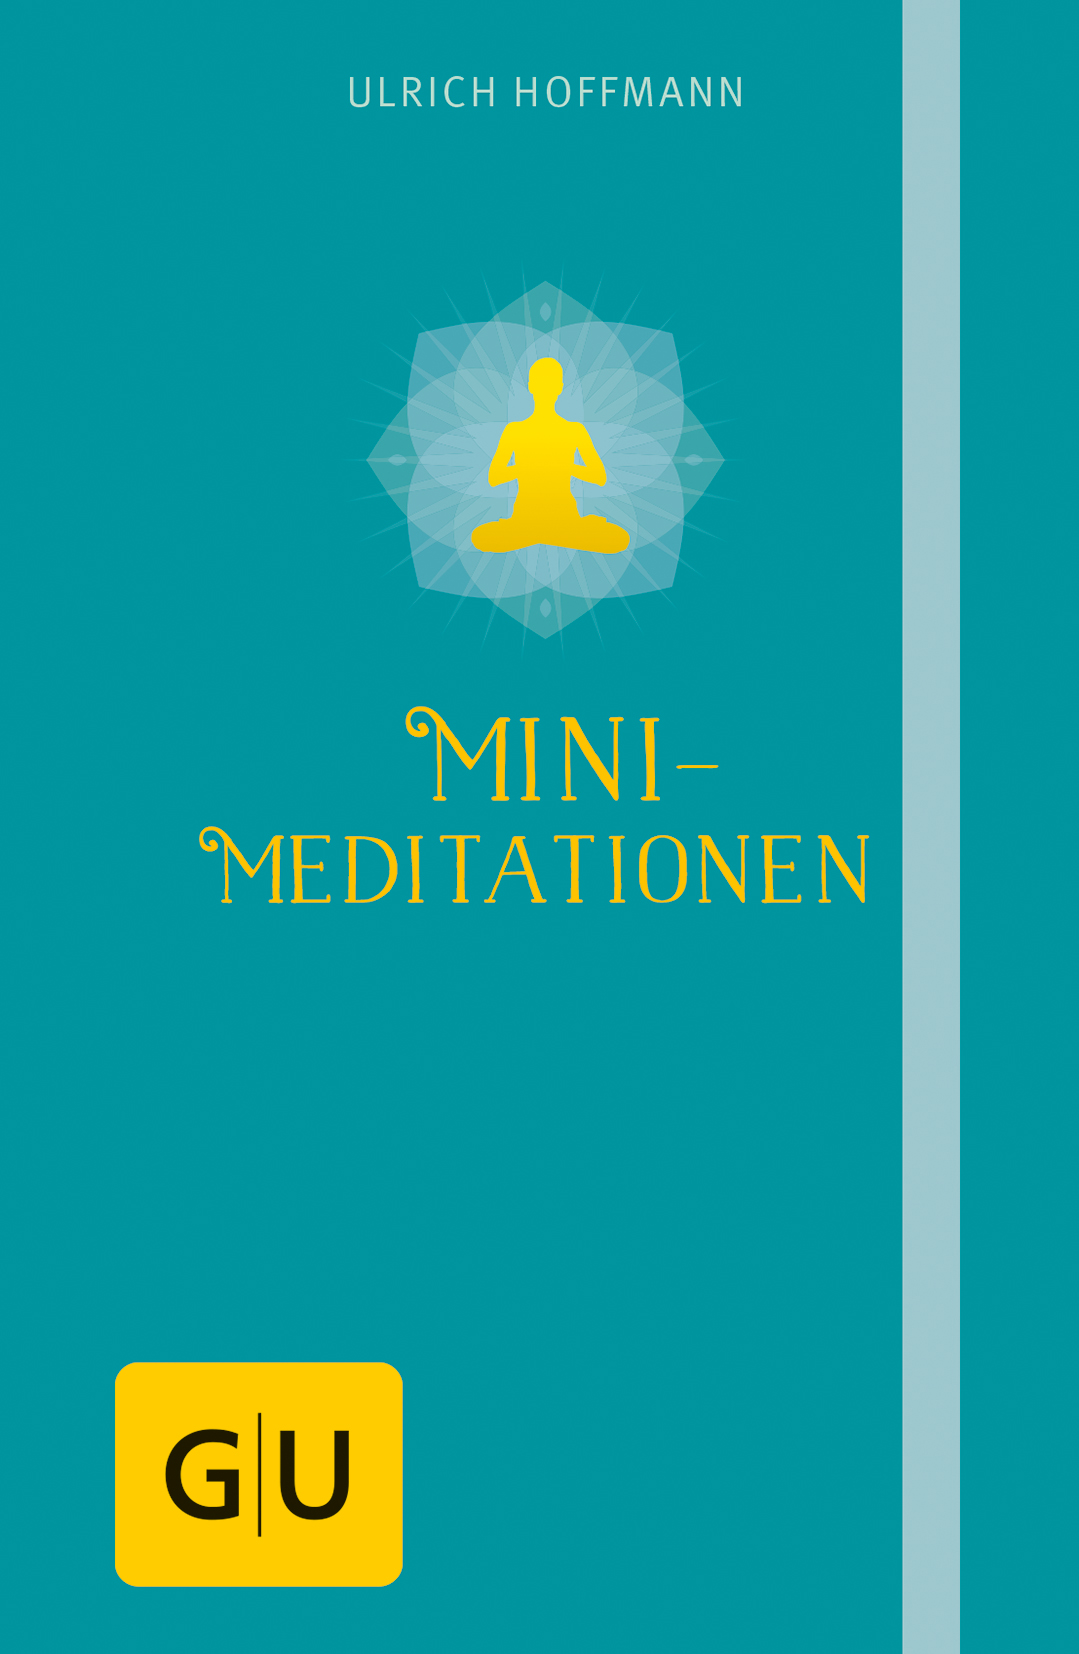 Mini-Meditationen - 300dpi